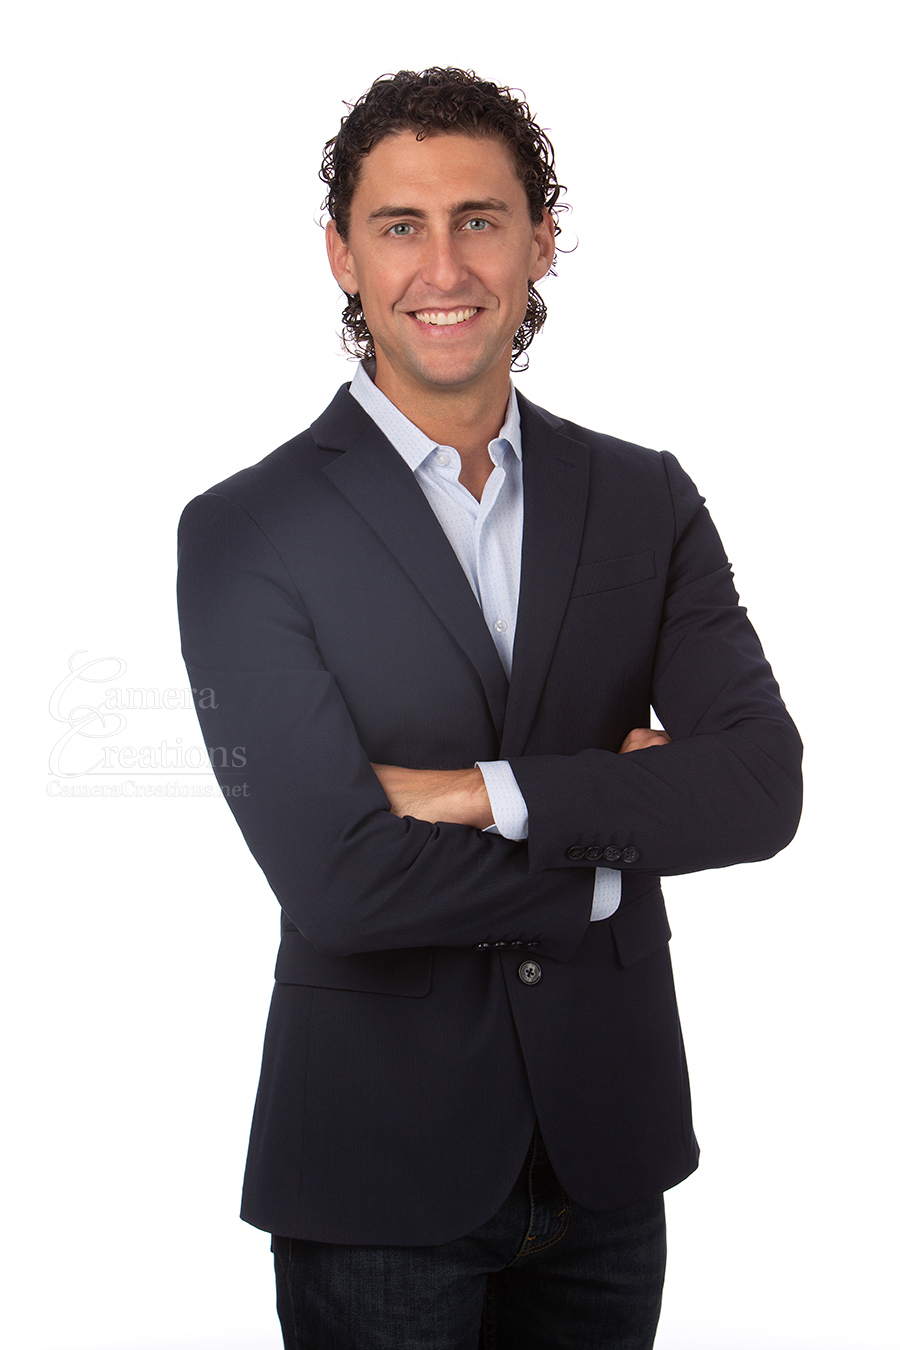 Attorney business headshot